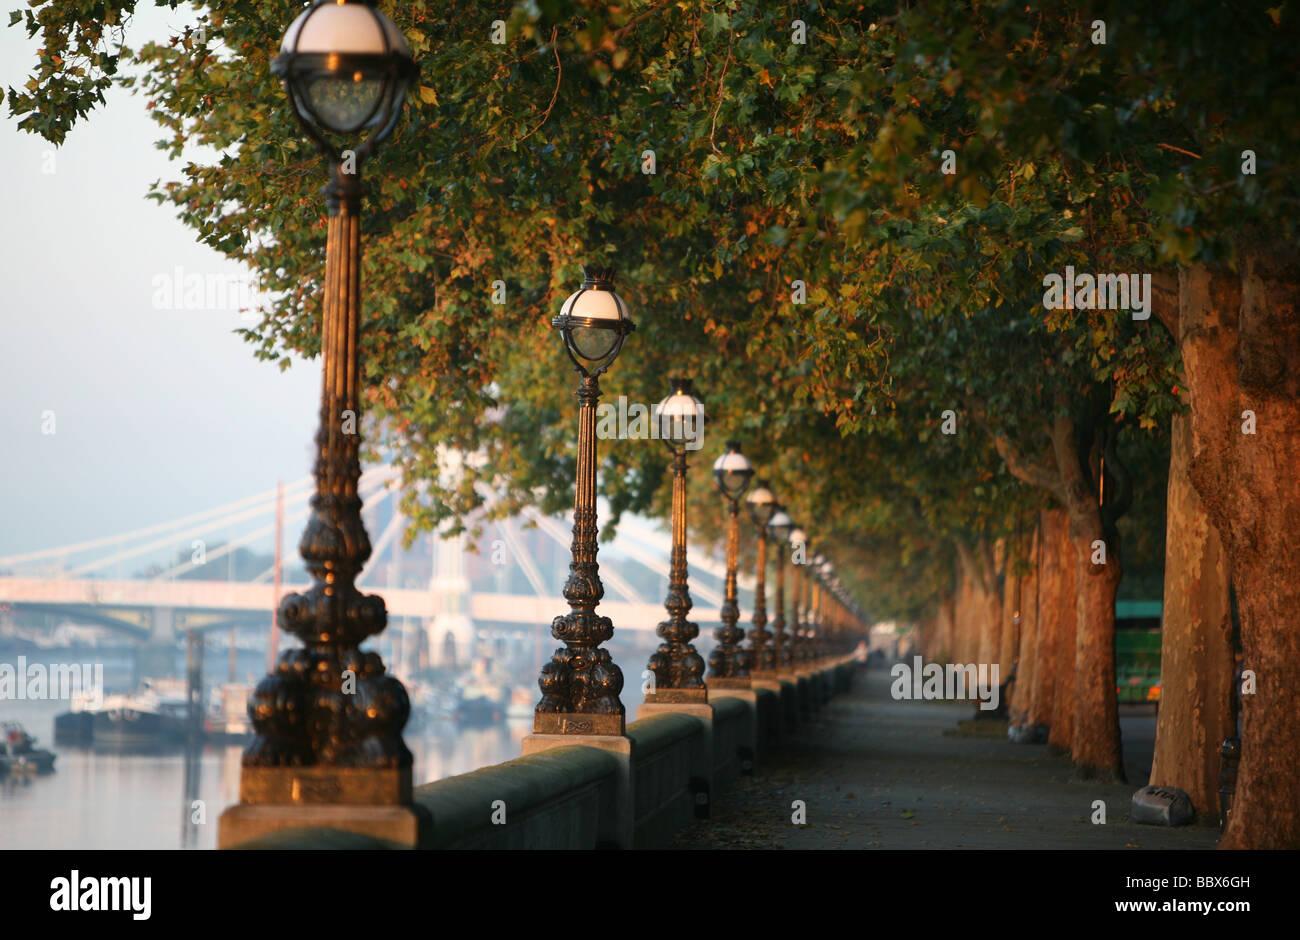 Sunrise At Chelsea Embankment In London Stock Photo Alamy